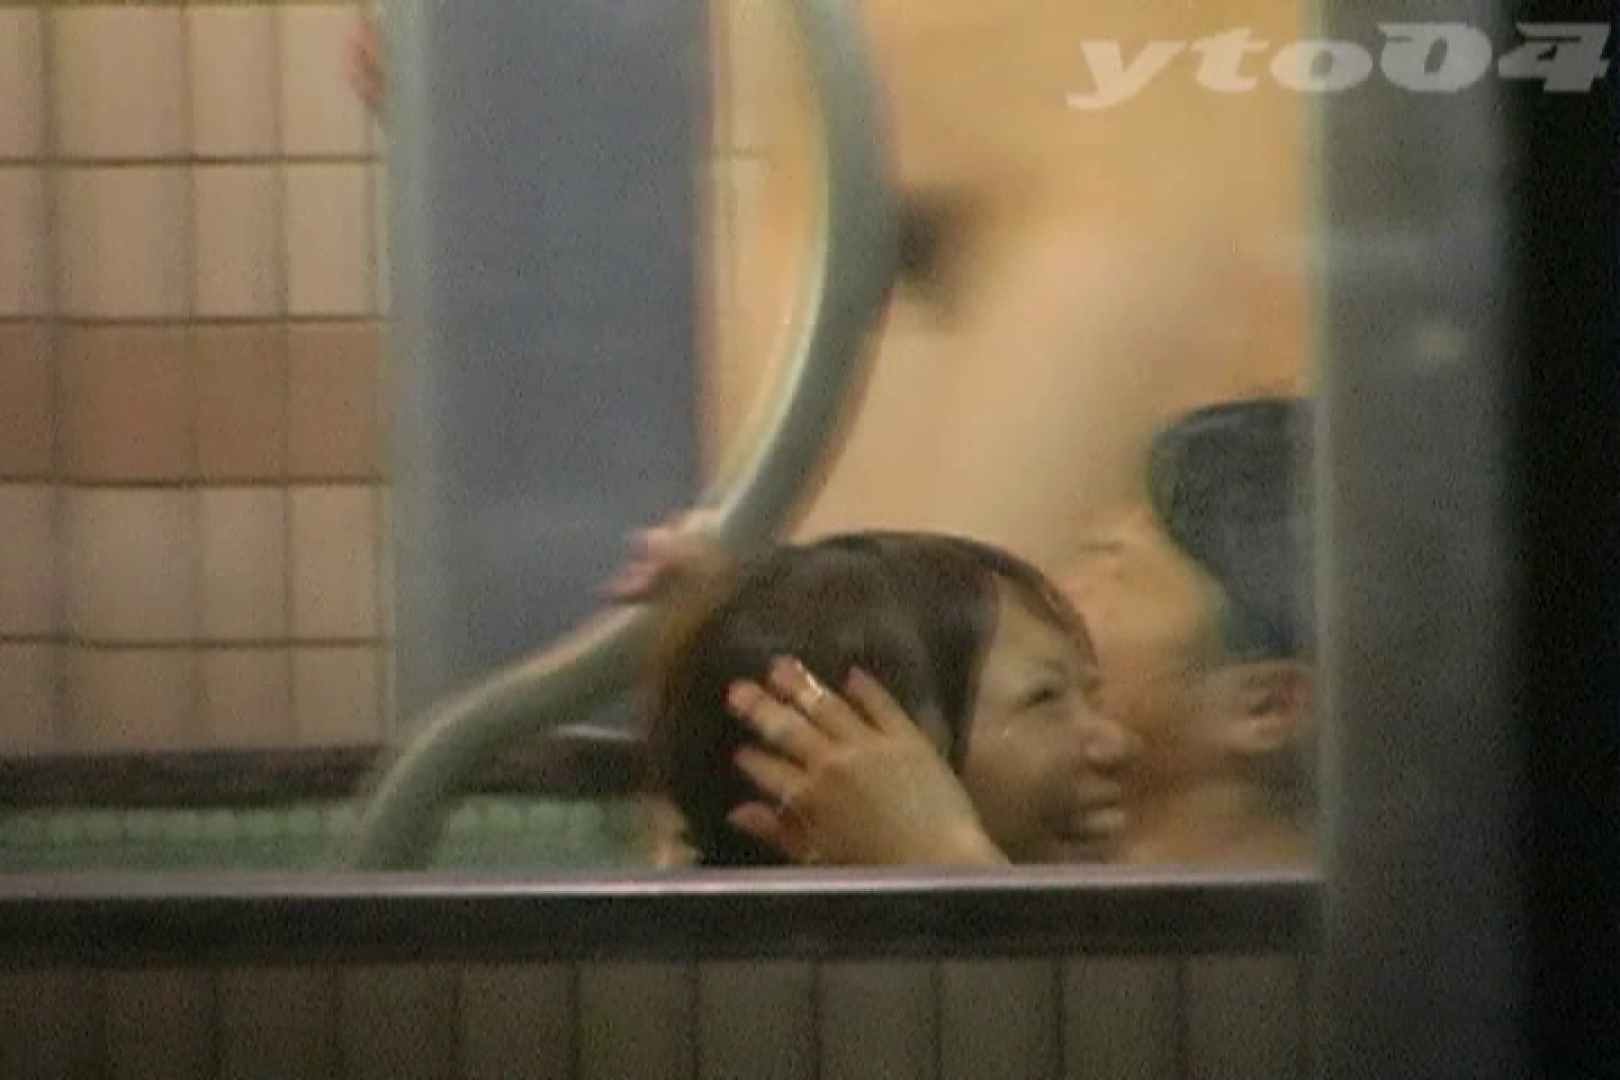 ▲復活限定▲合宿ホテル女風呂盗撮 Vol.24 名作  55pic 11